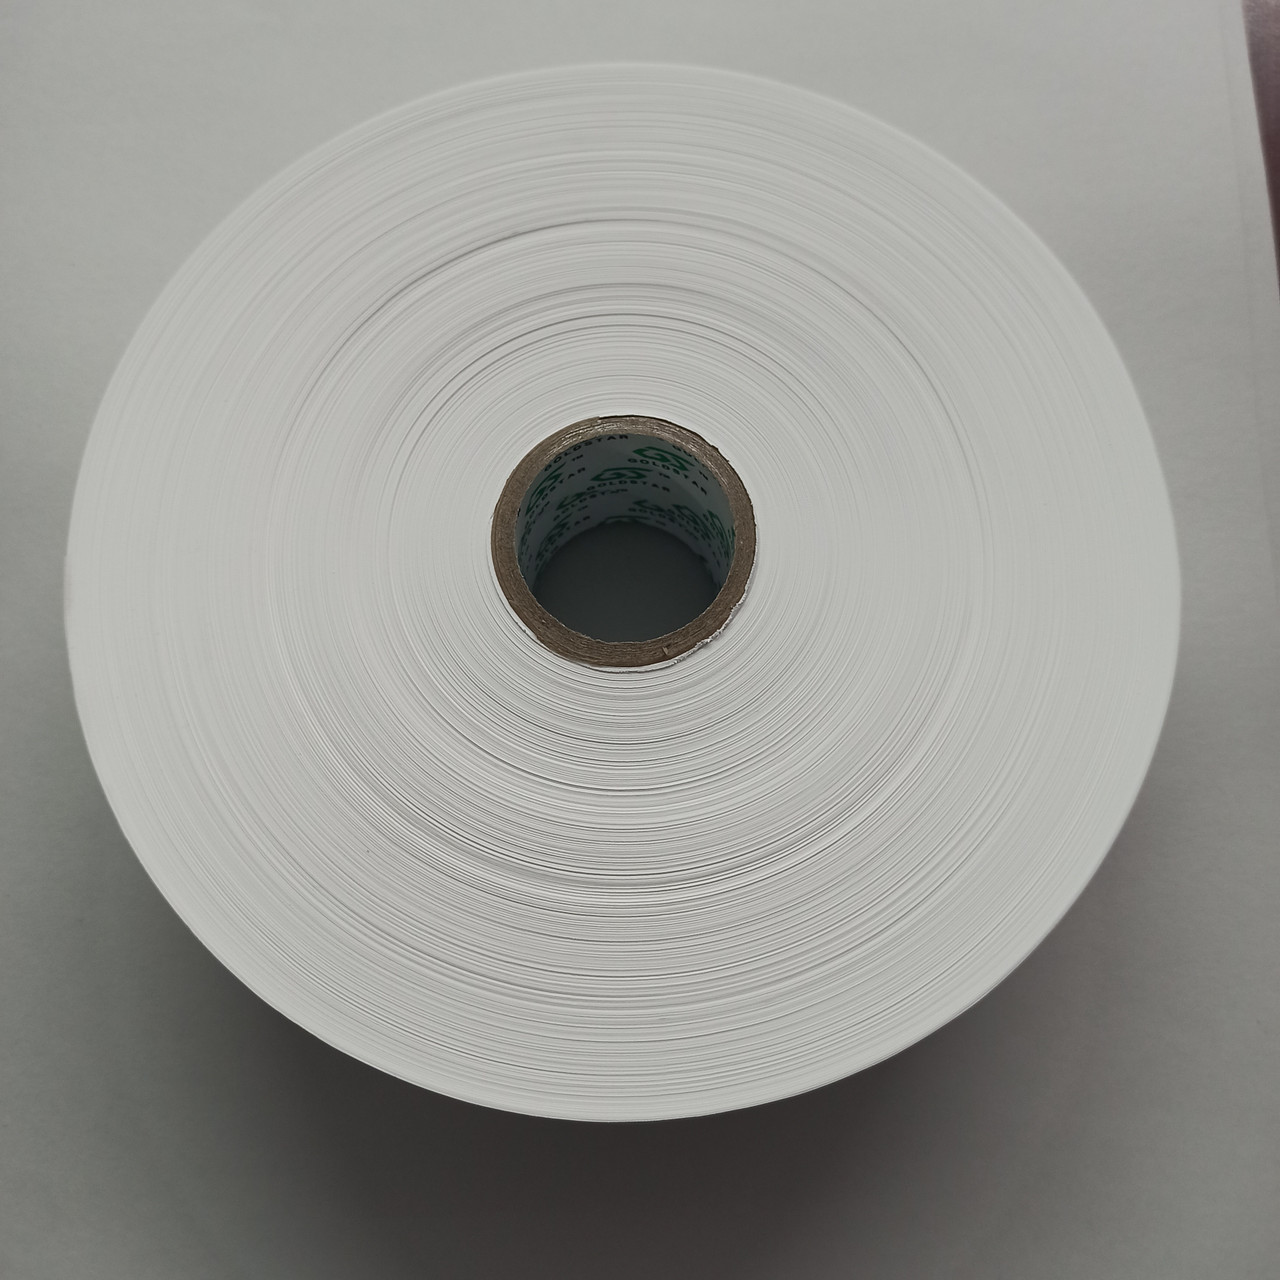 Taffeta Roll Washable Paper  for Laundry Tagging Purpose